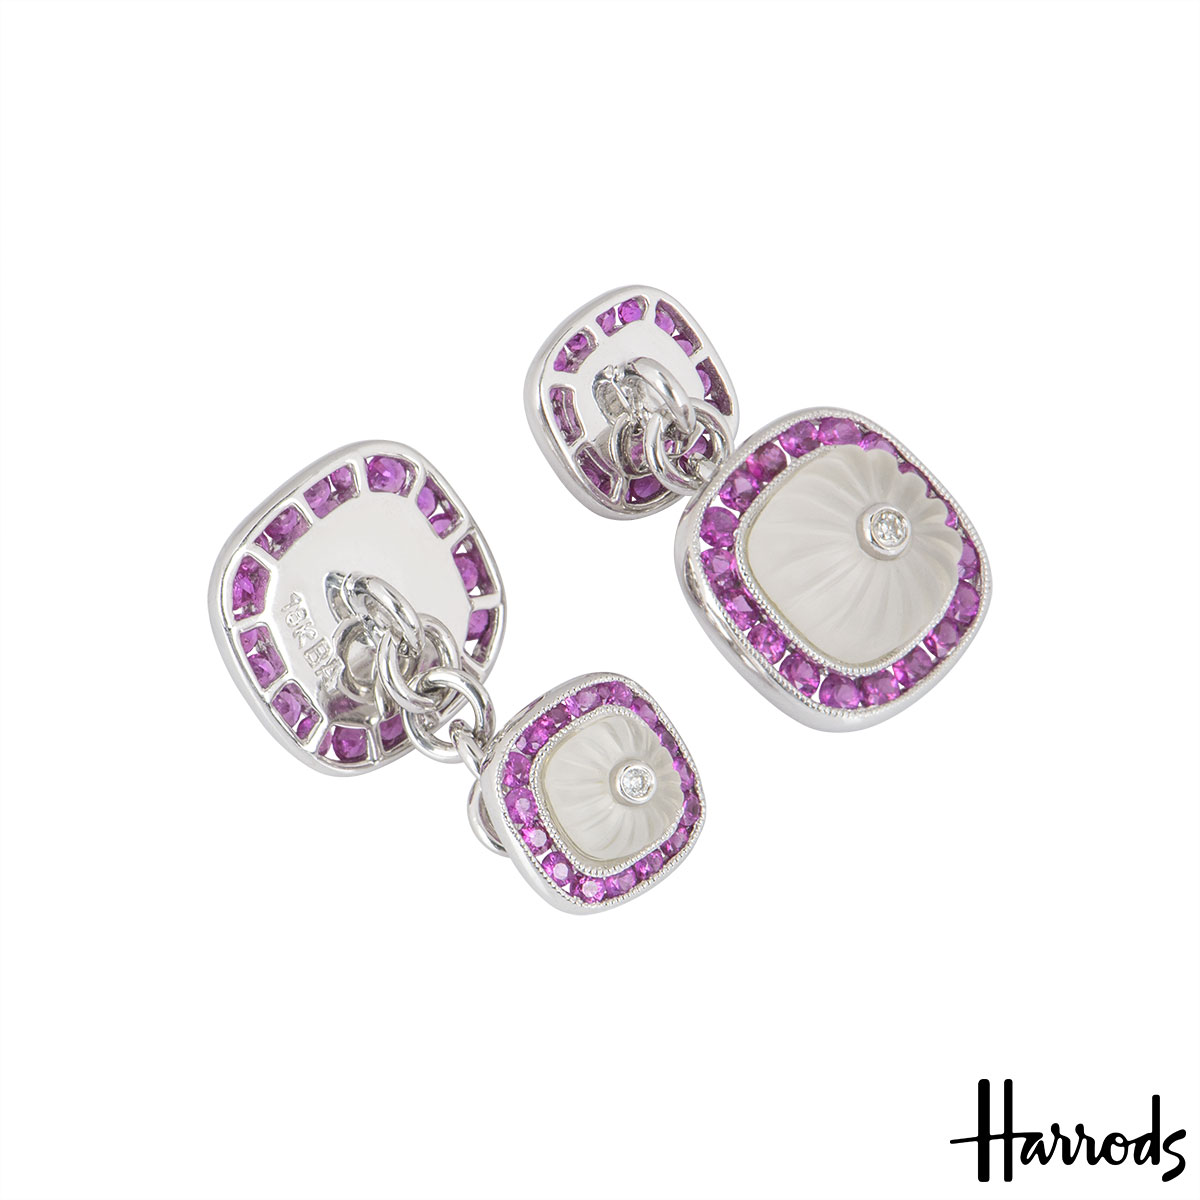 Harrods White Gold Diamond & Multi-Gem Cufflinks